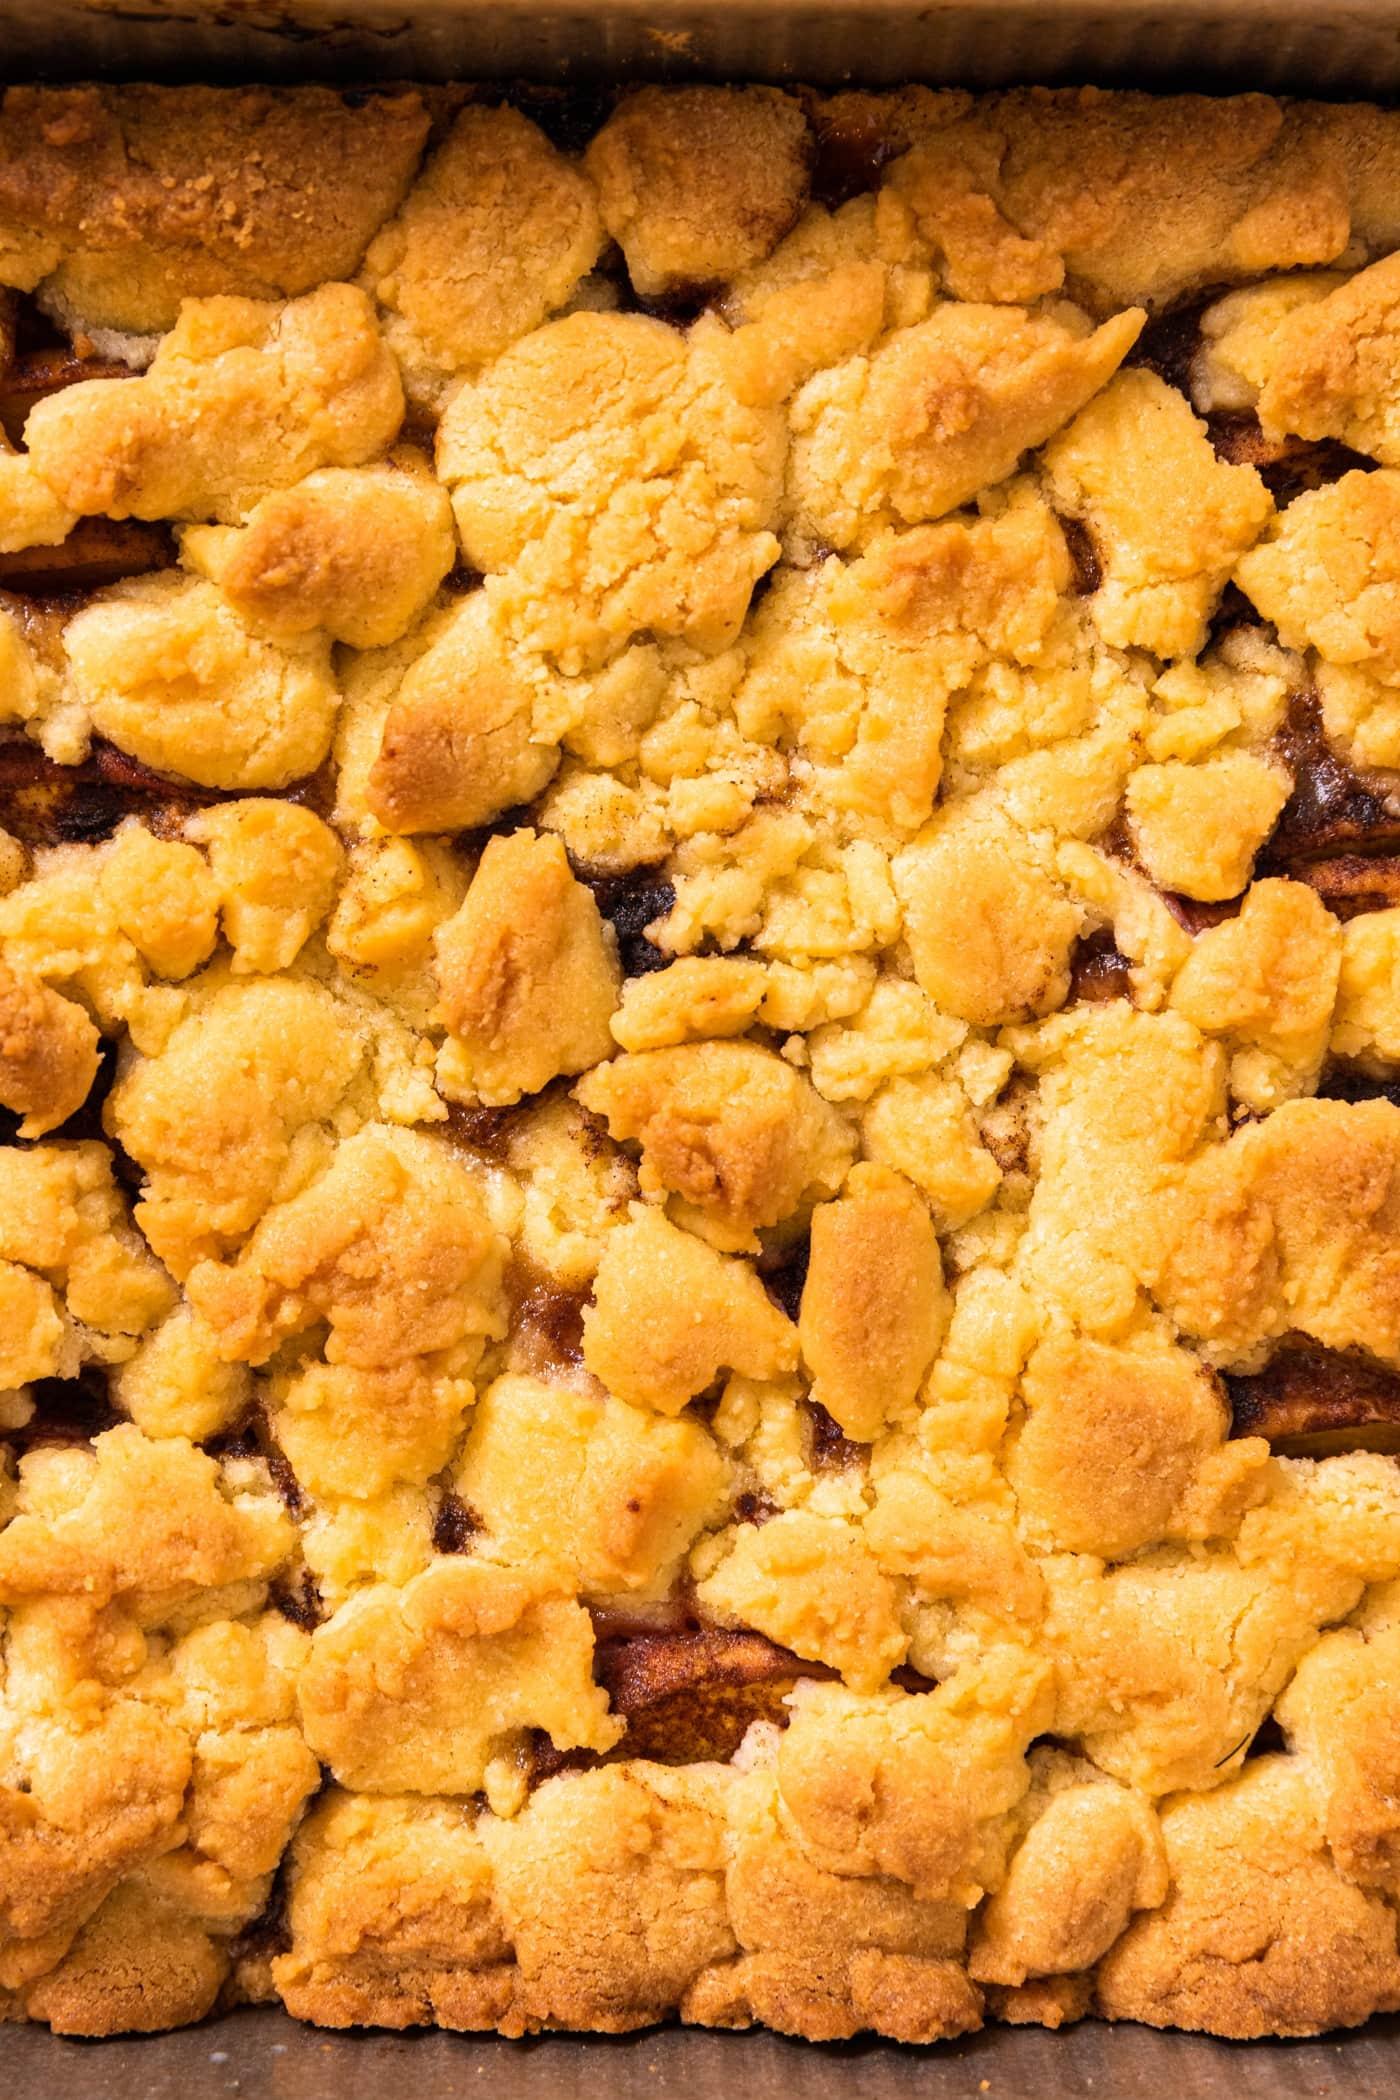 Top down view of golden brown crust on top of beach crumb bars